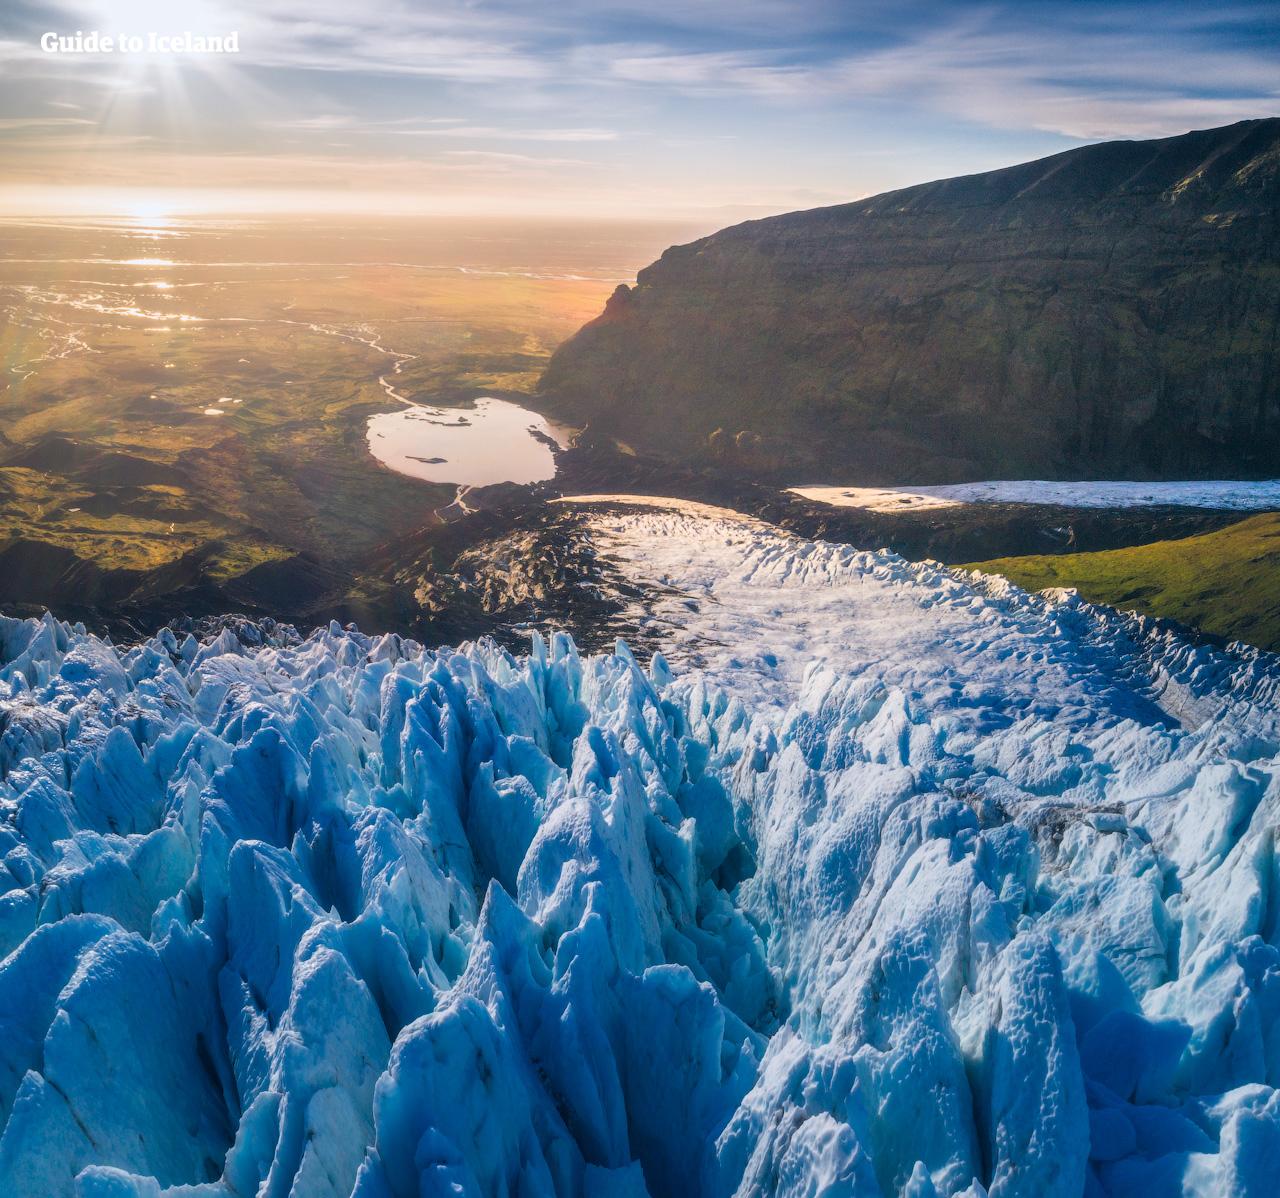 Vatnajokull covers 8% of Iceland's landmass.